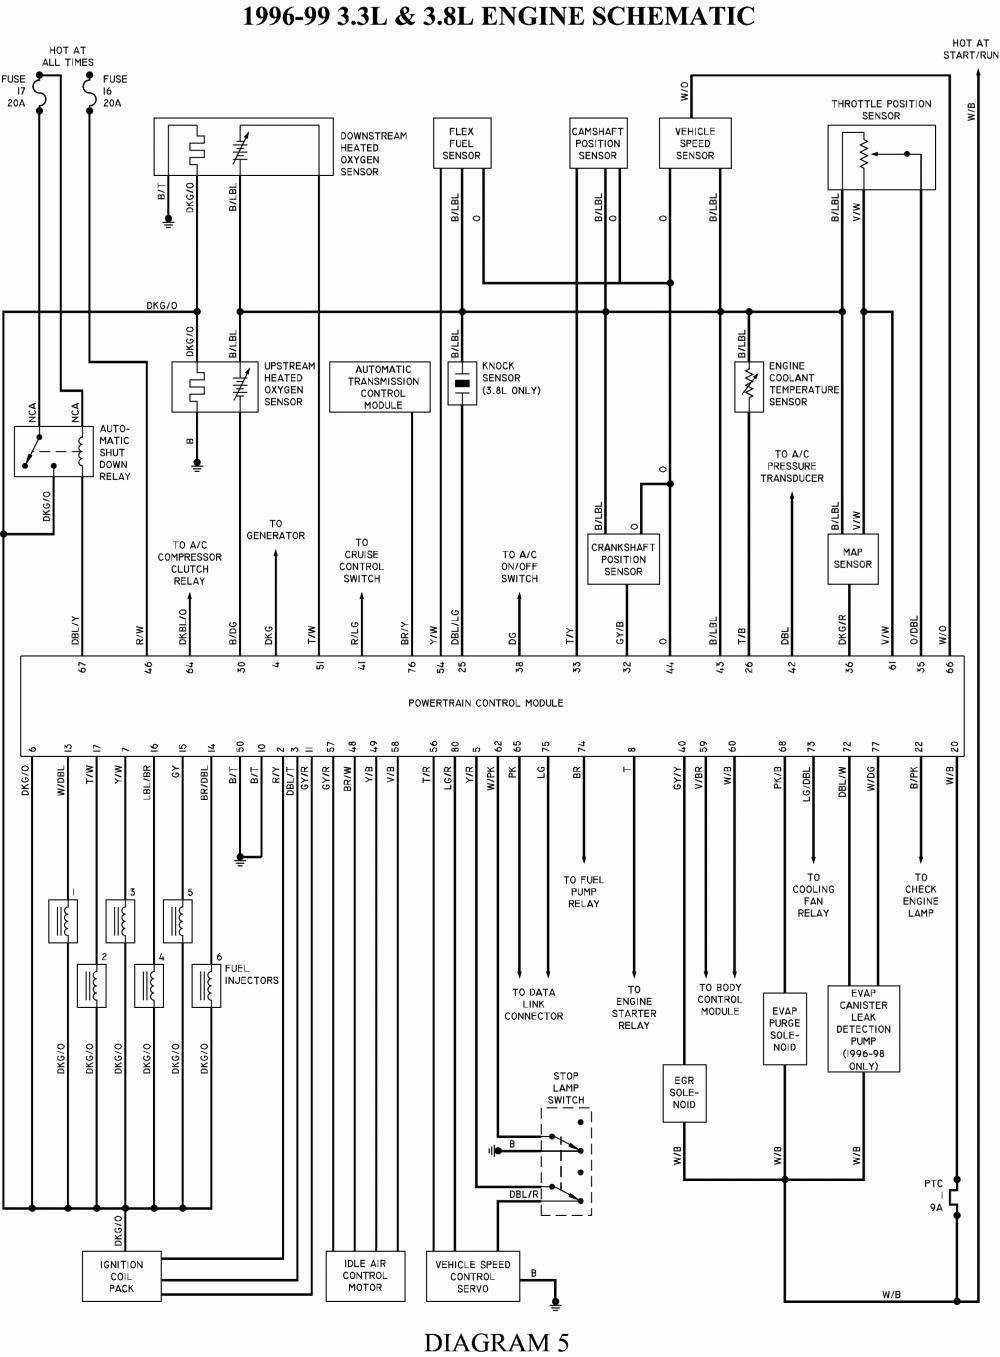 DW_8689] Wiring Diagram 1953 Plymouth Schematic Wiring  Reda Erek Oxyt Numap Exxlu Sianu Vulg Simij Penghe Mohammedshrine Librar  Wiring 101